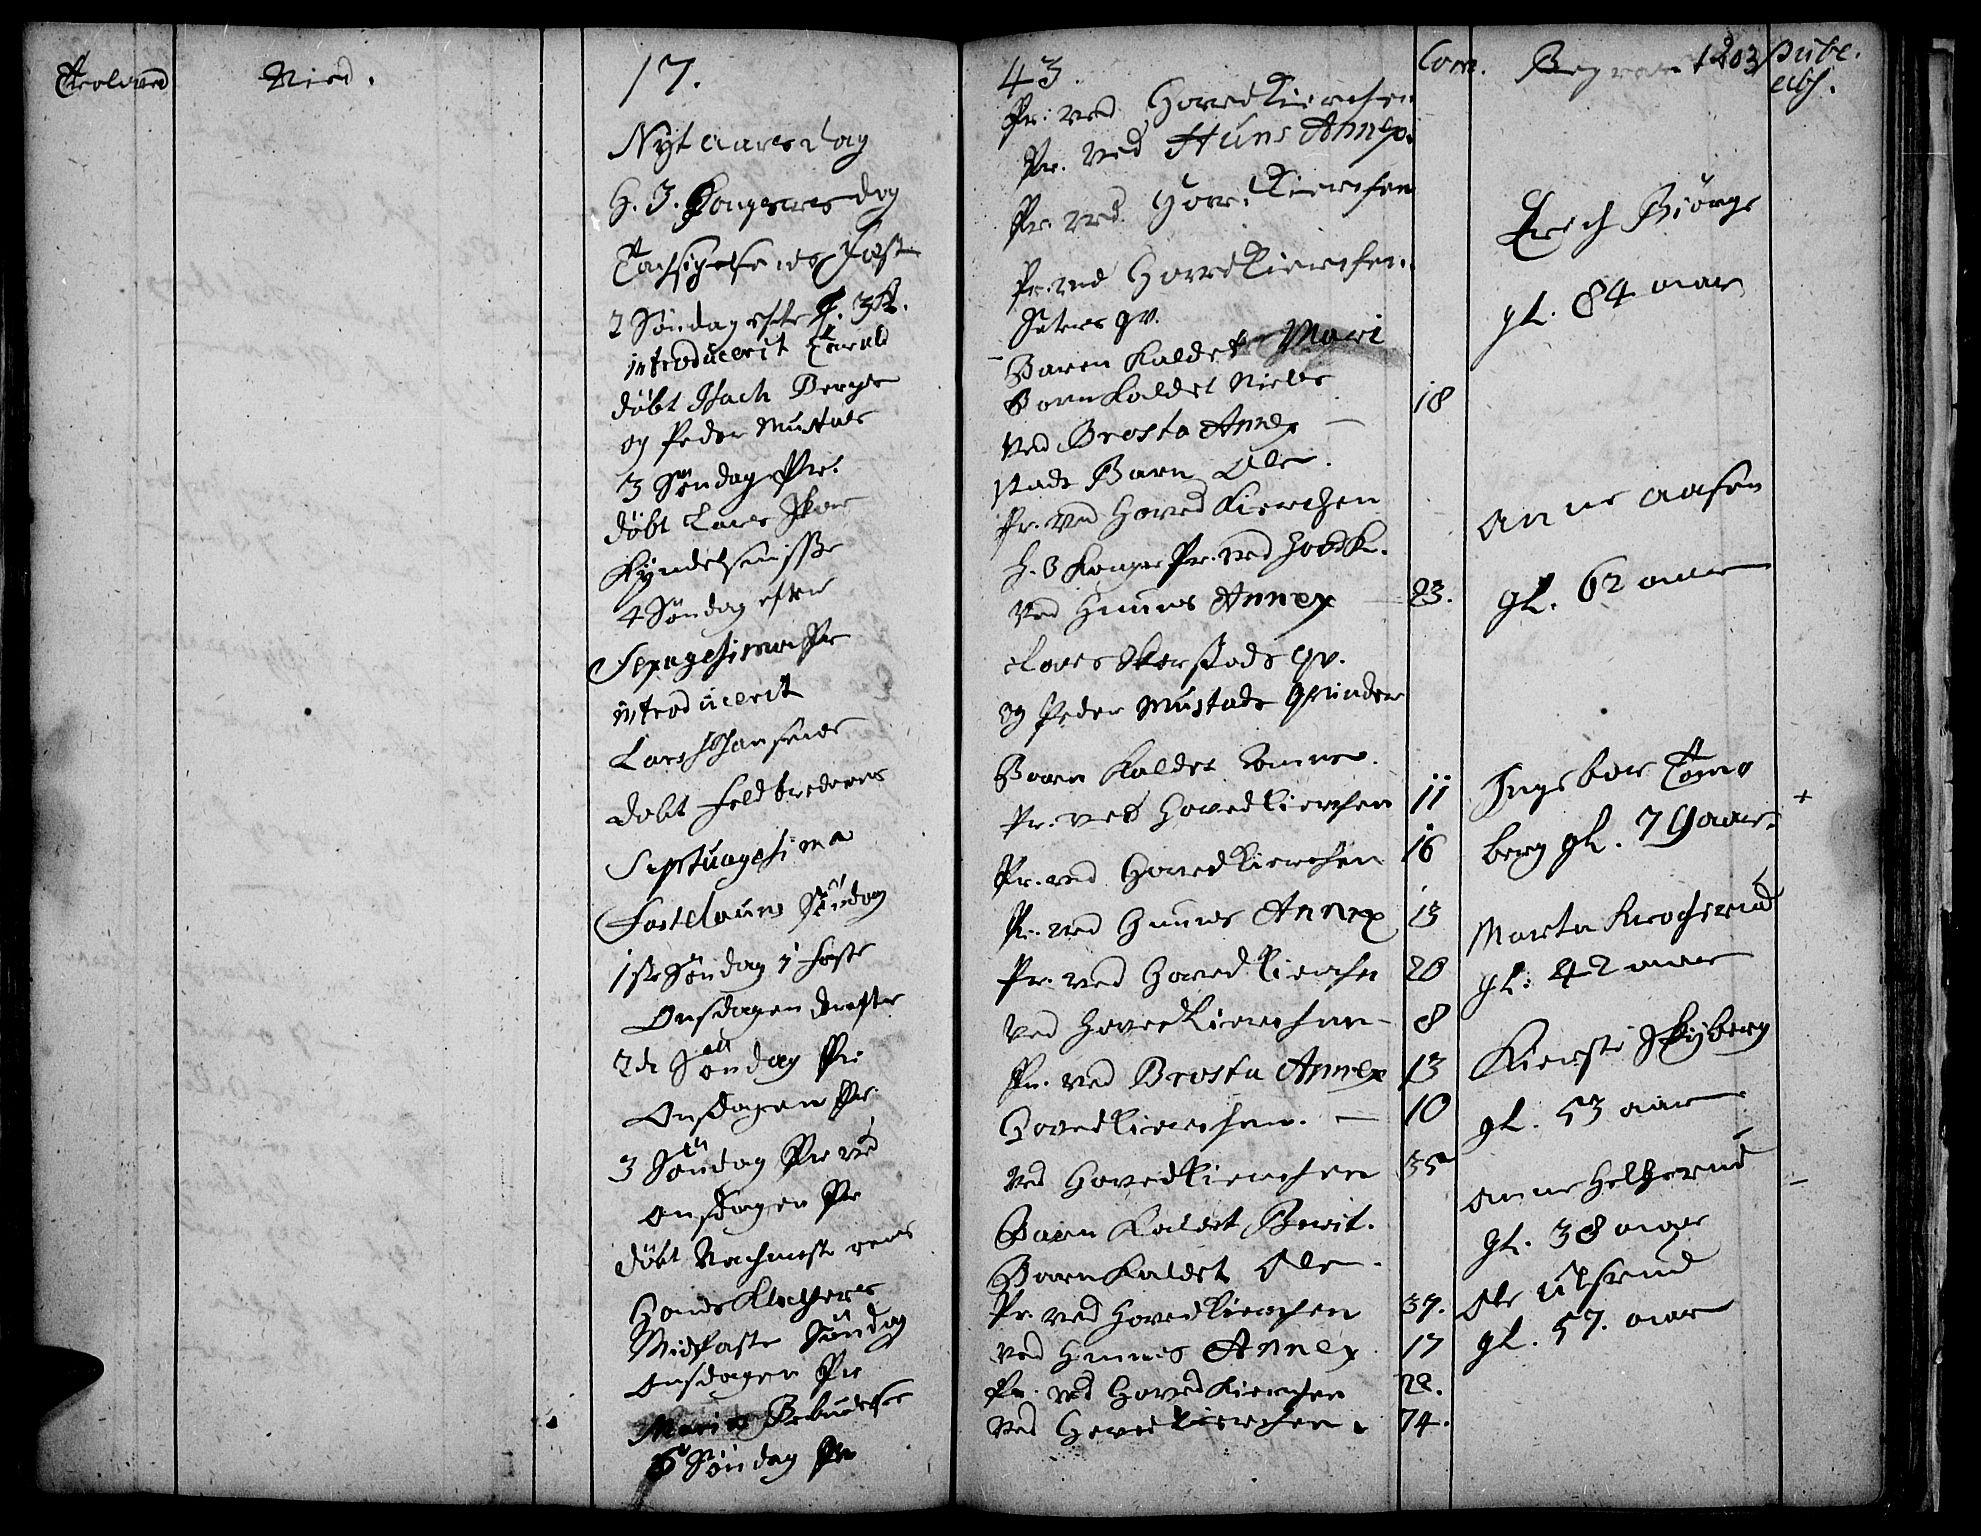 SAH, Vardal prestekontor, H/Ha/Haa/L0001: Ministerialbok nr. 1, 1706-1748, s. 203